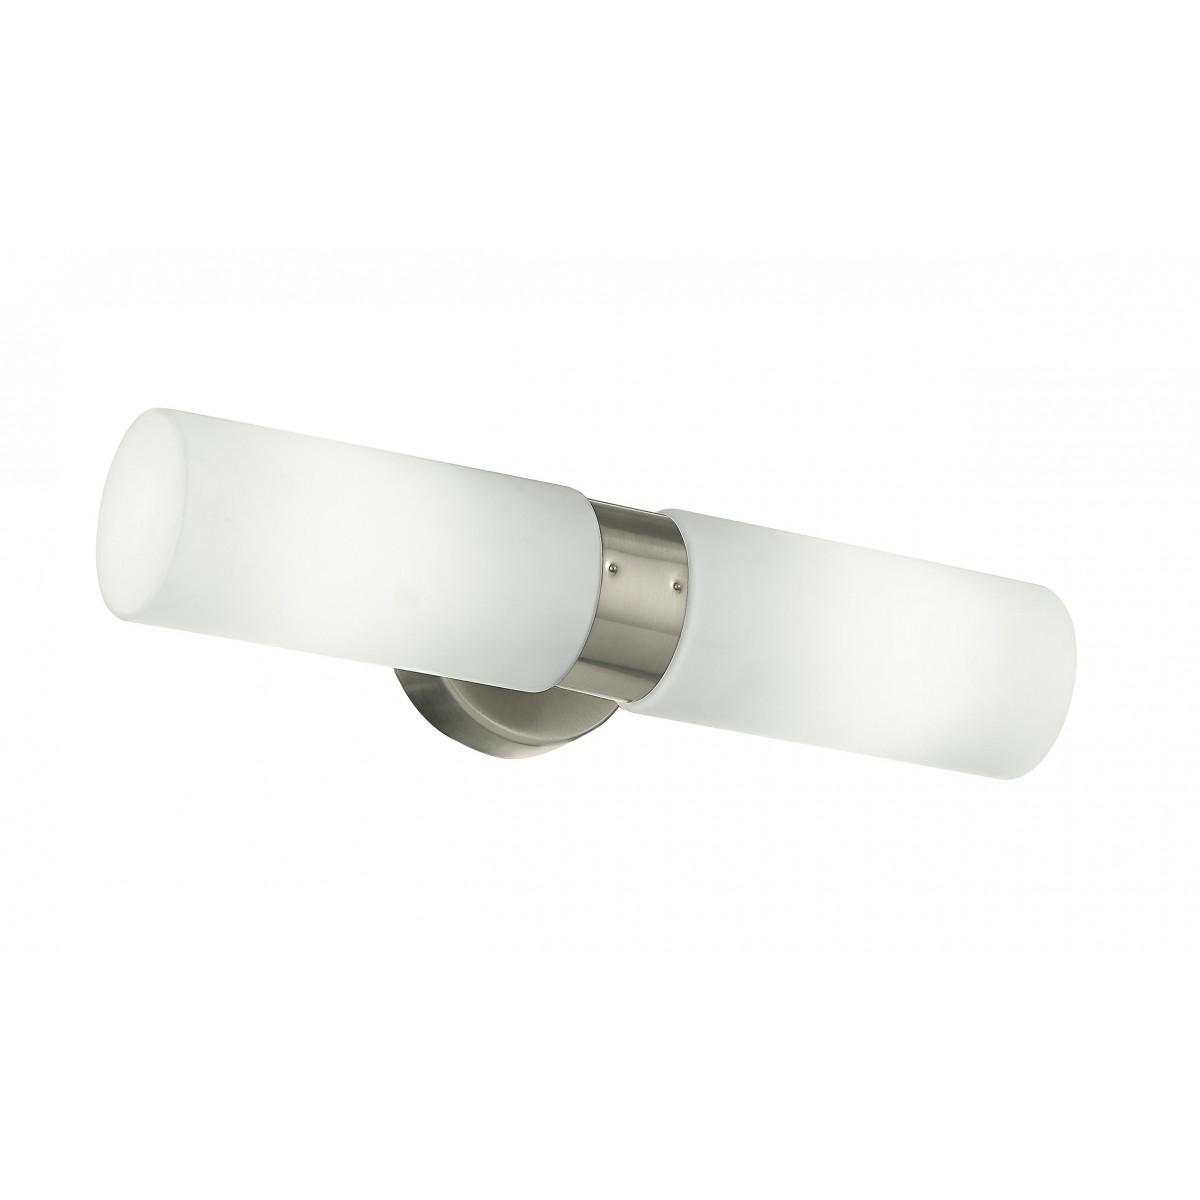 SPOT-B-JOY - Applique nickel e vetro